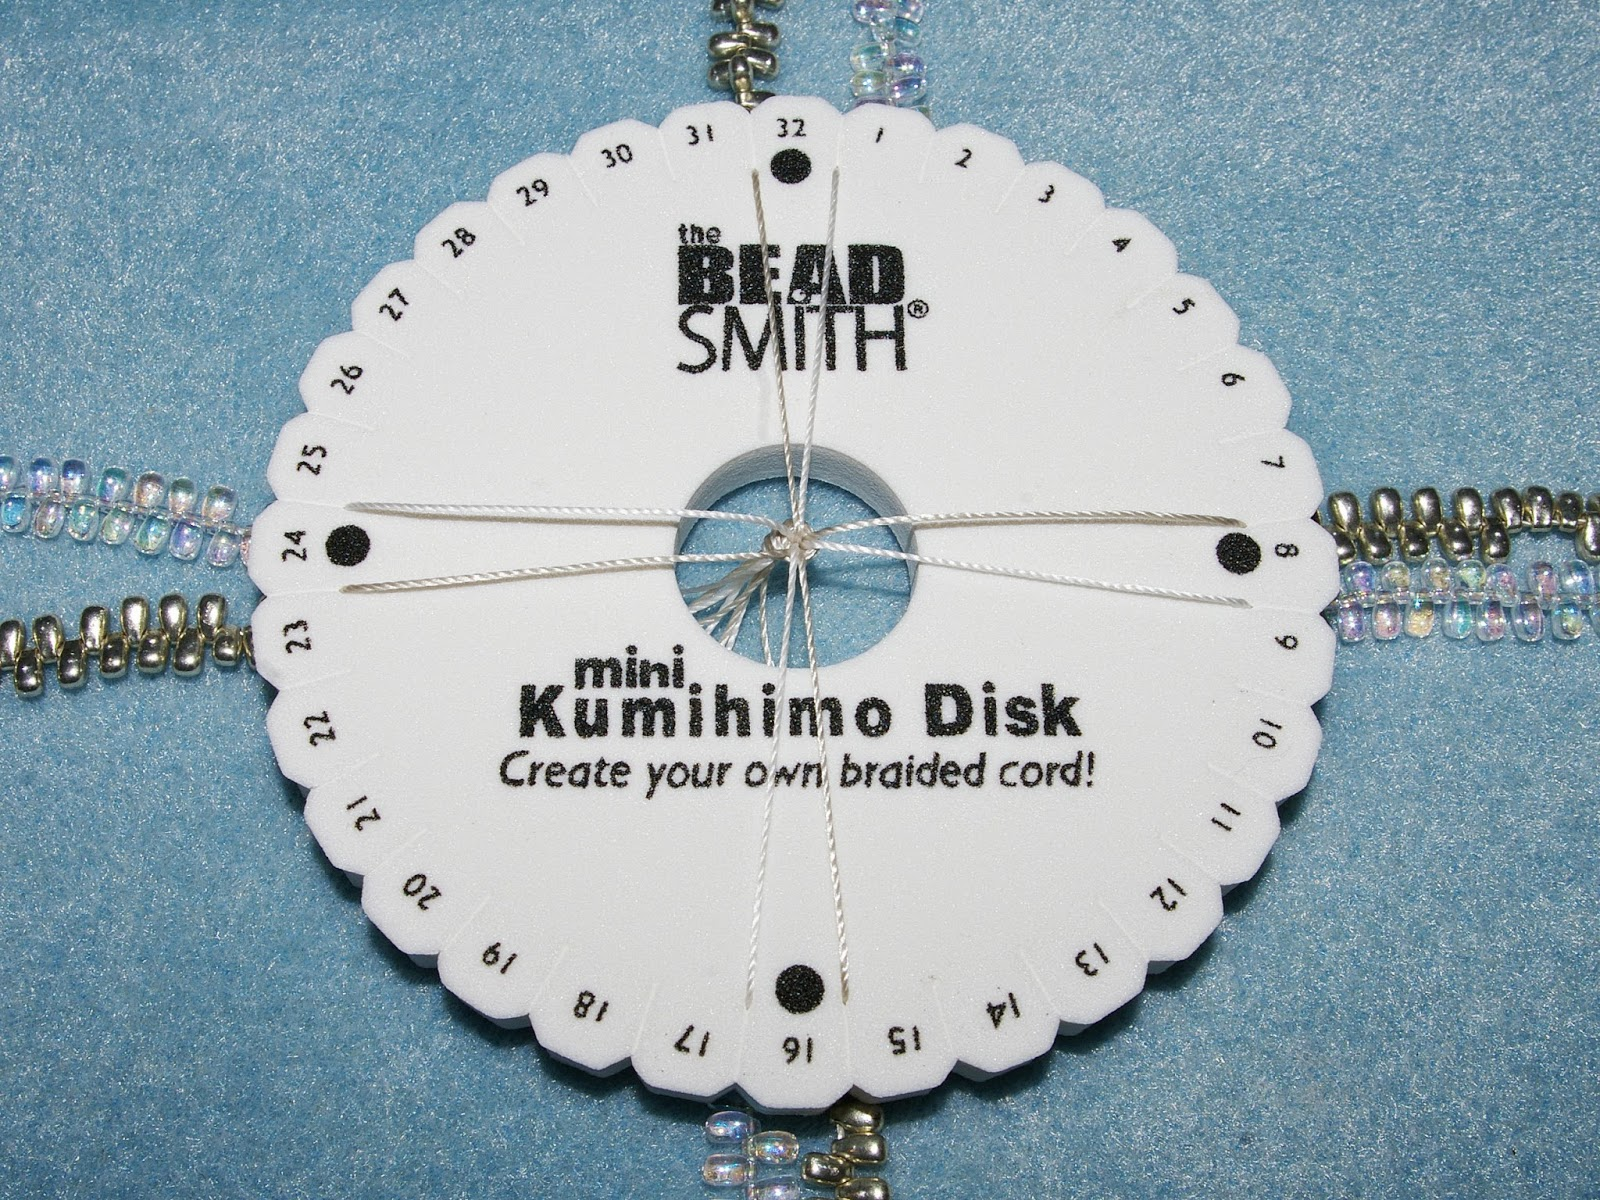 Kumihimo - Braiding with beads tutorial – Nosek's Just Gems